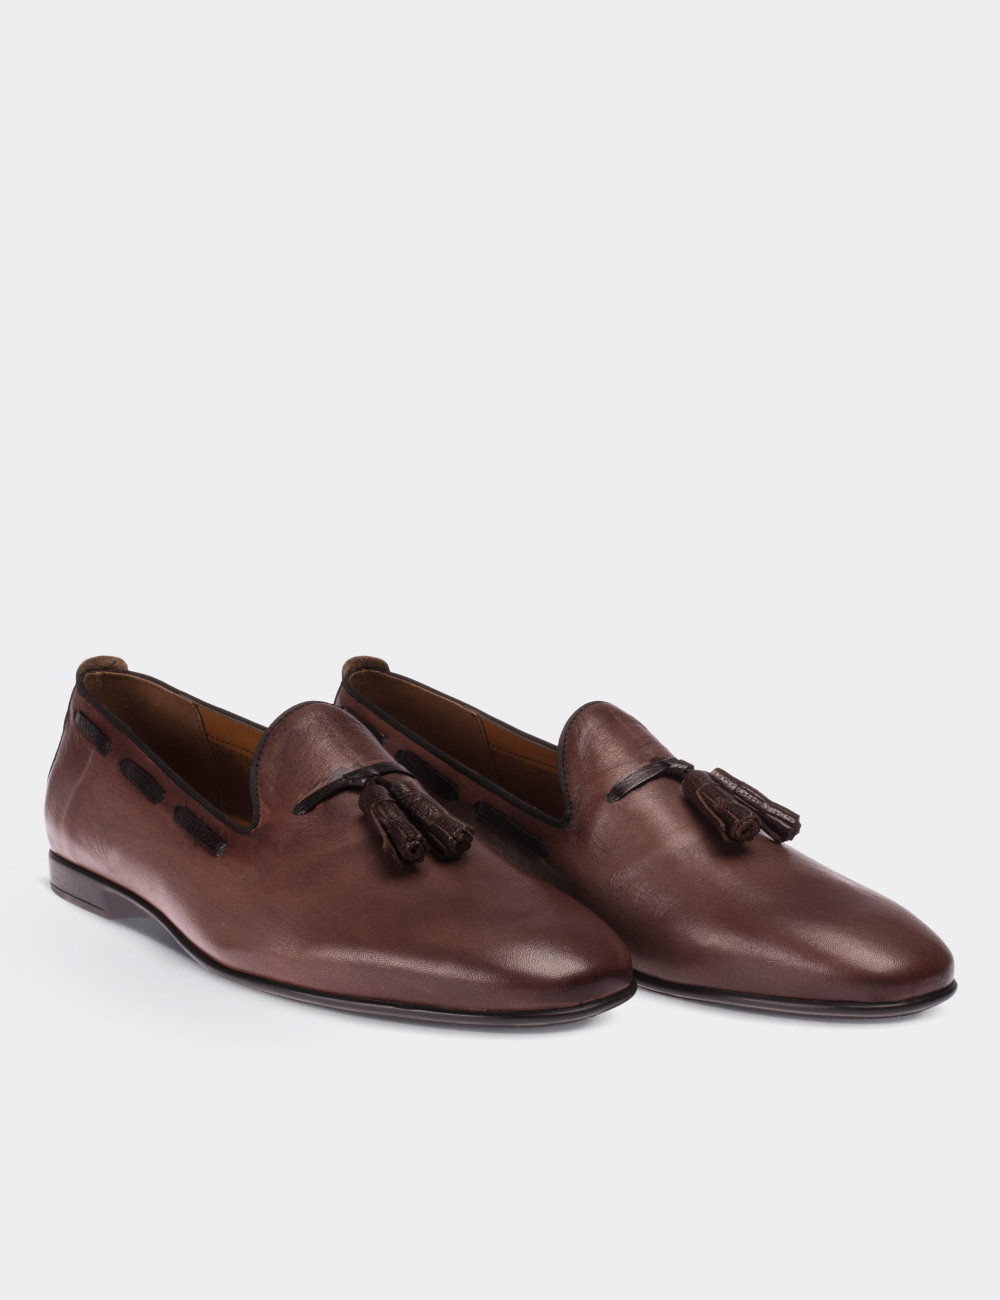 Hakiki Deri Kahverengi Loafer Erkek Ayakkabı - 01643MKHVC02